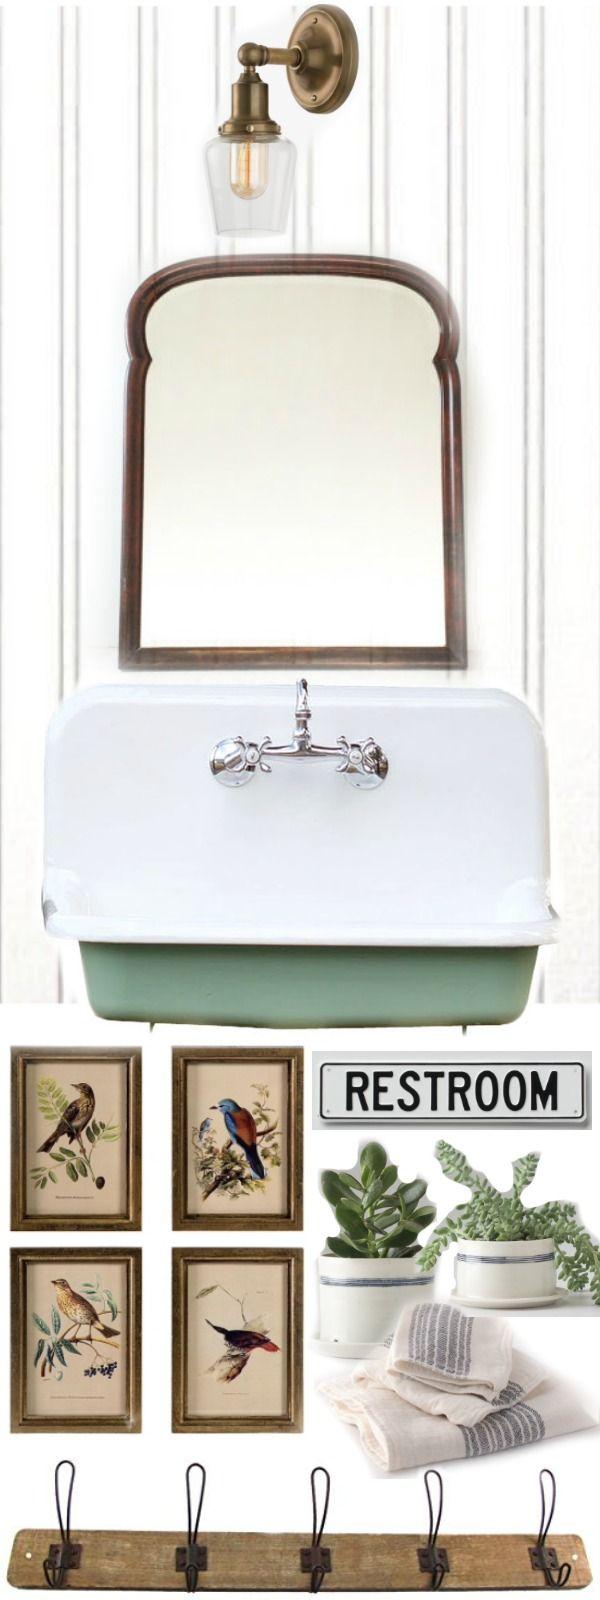 Entryway Bathroom Makeover – The Design |